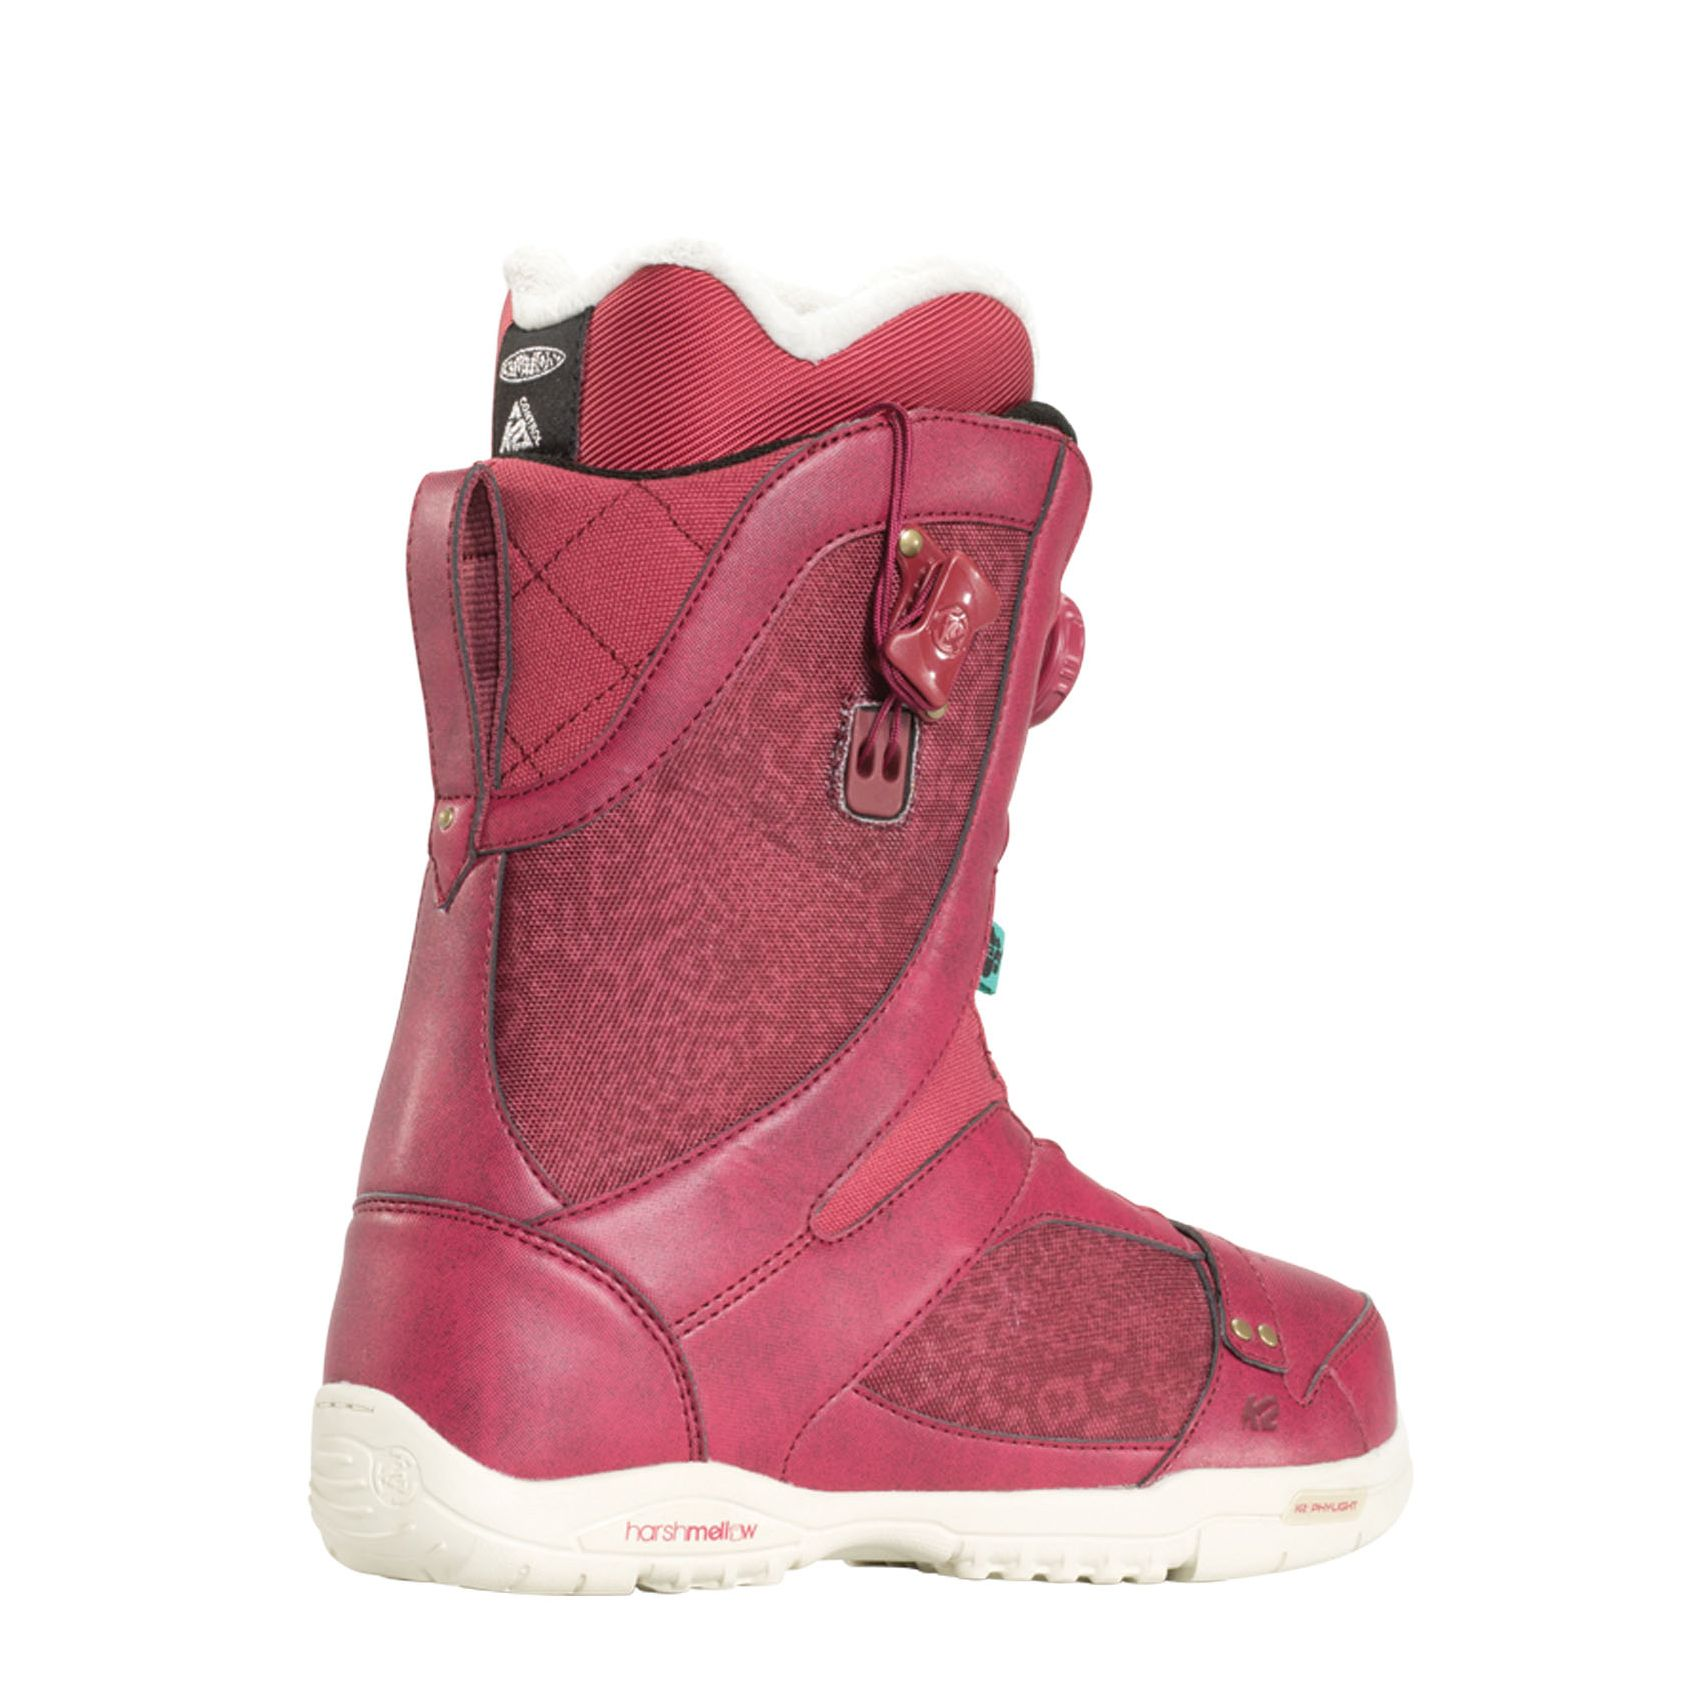 k2 womens snowboard boots sapera boa all